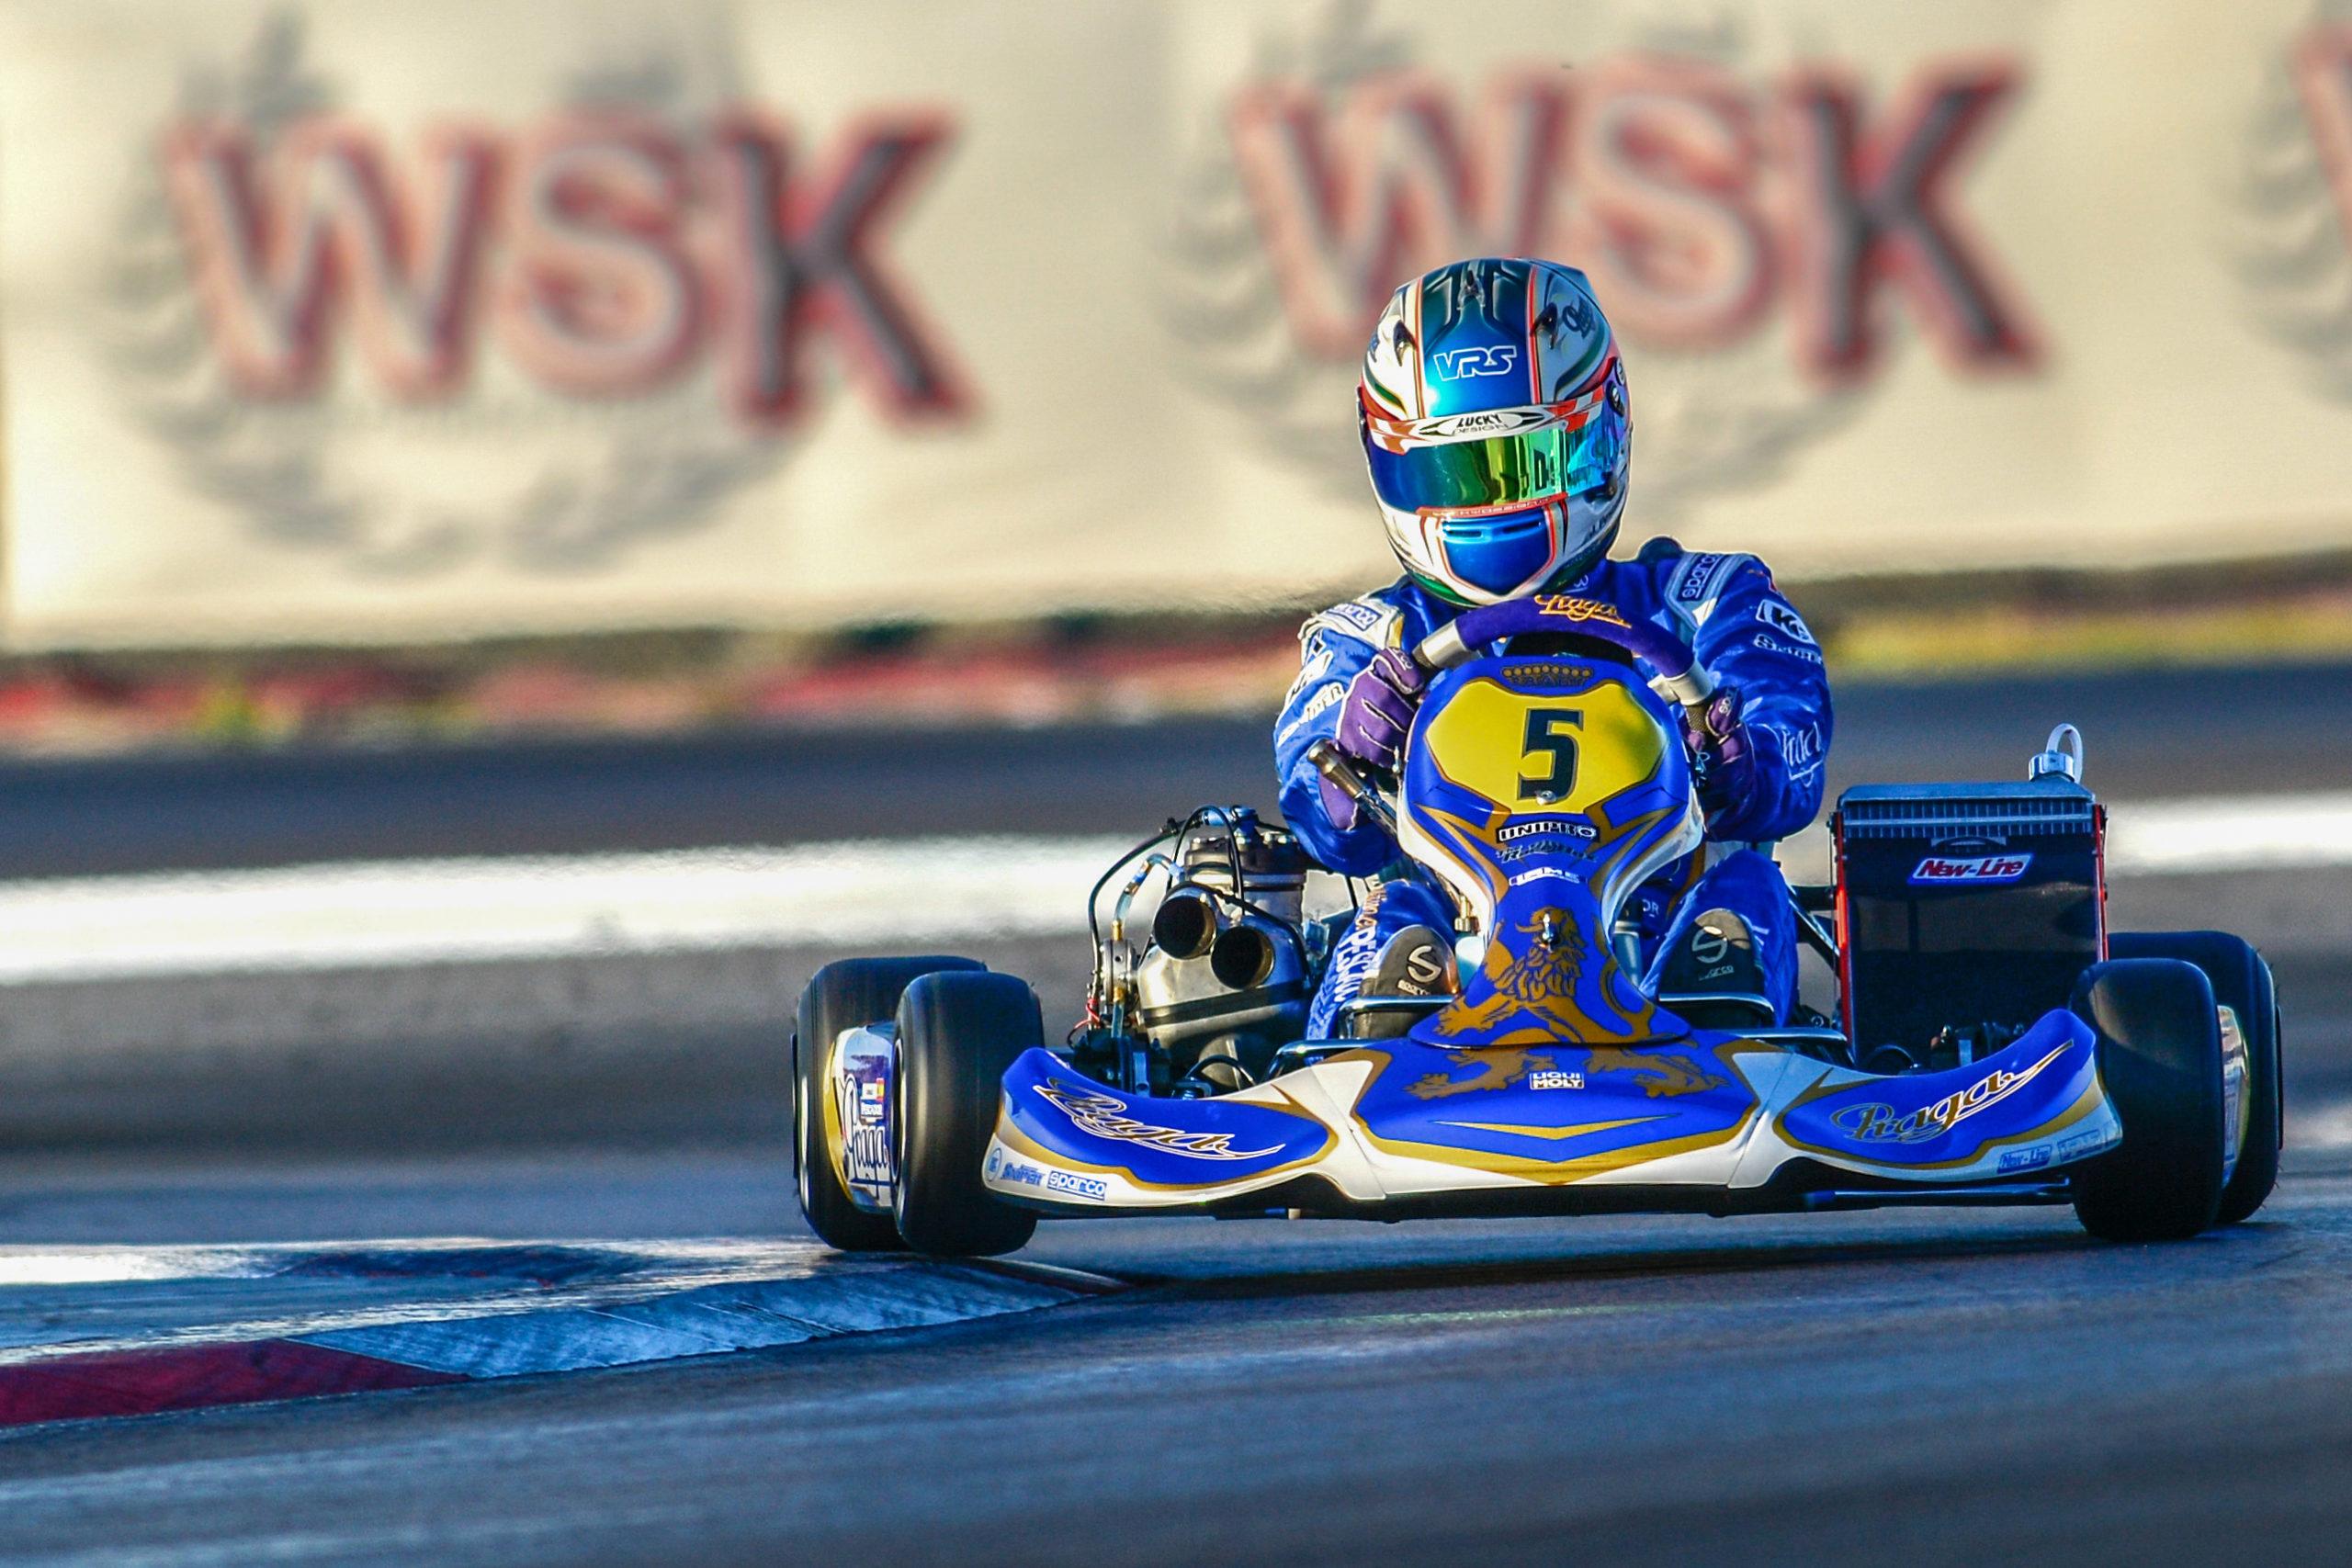 Praga on the podium again! WSK Master series - Adria